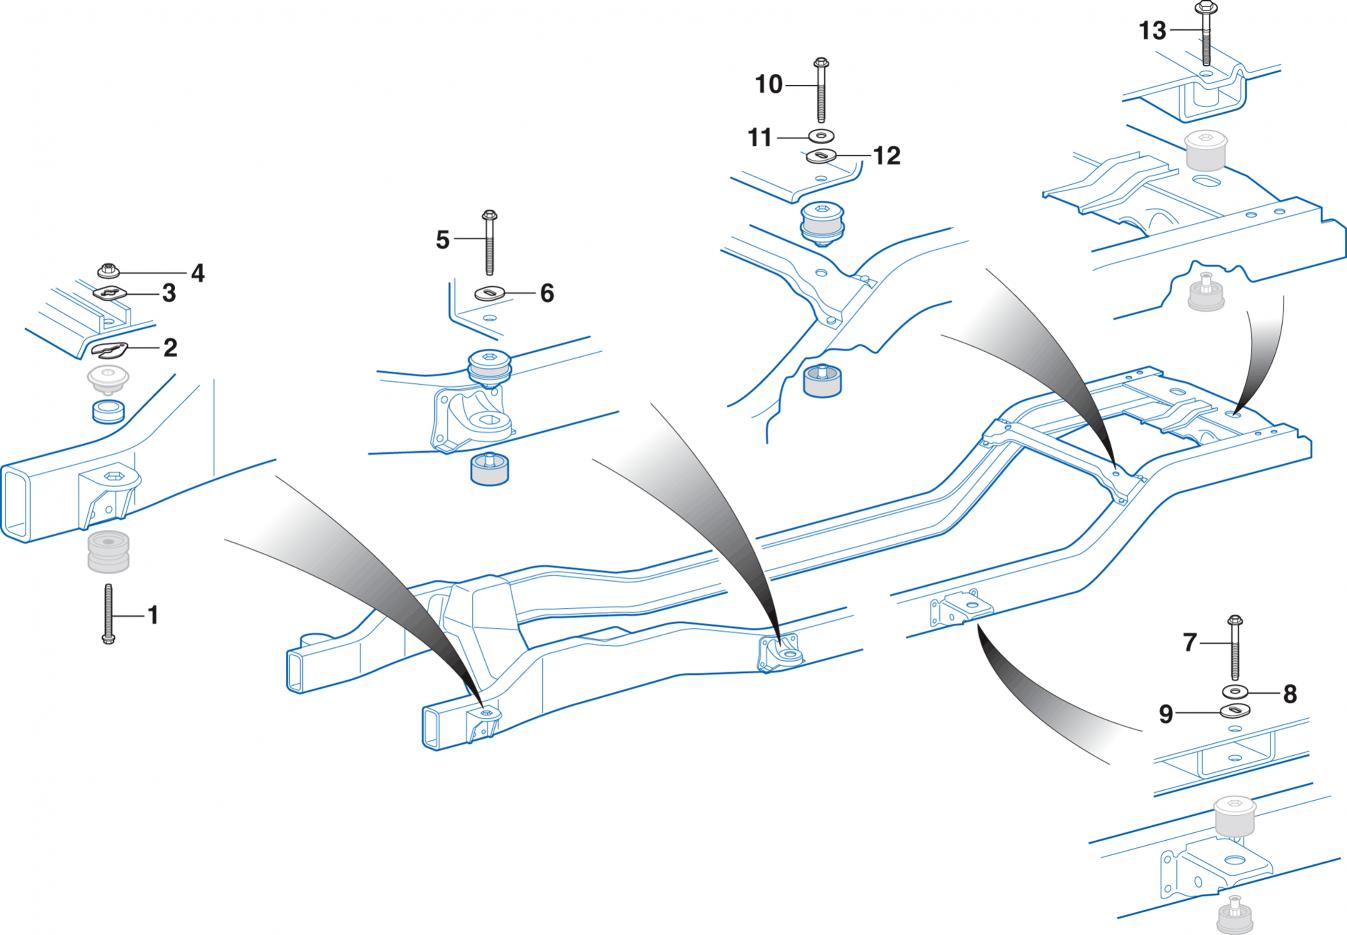 Radiator Core and Body Mounting Hardware